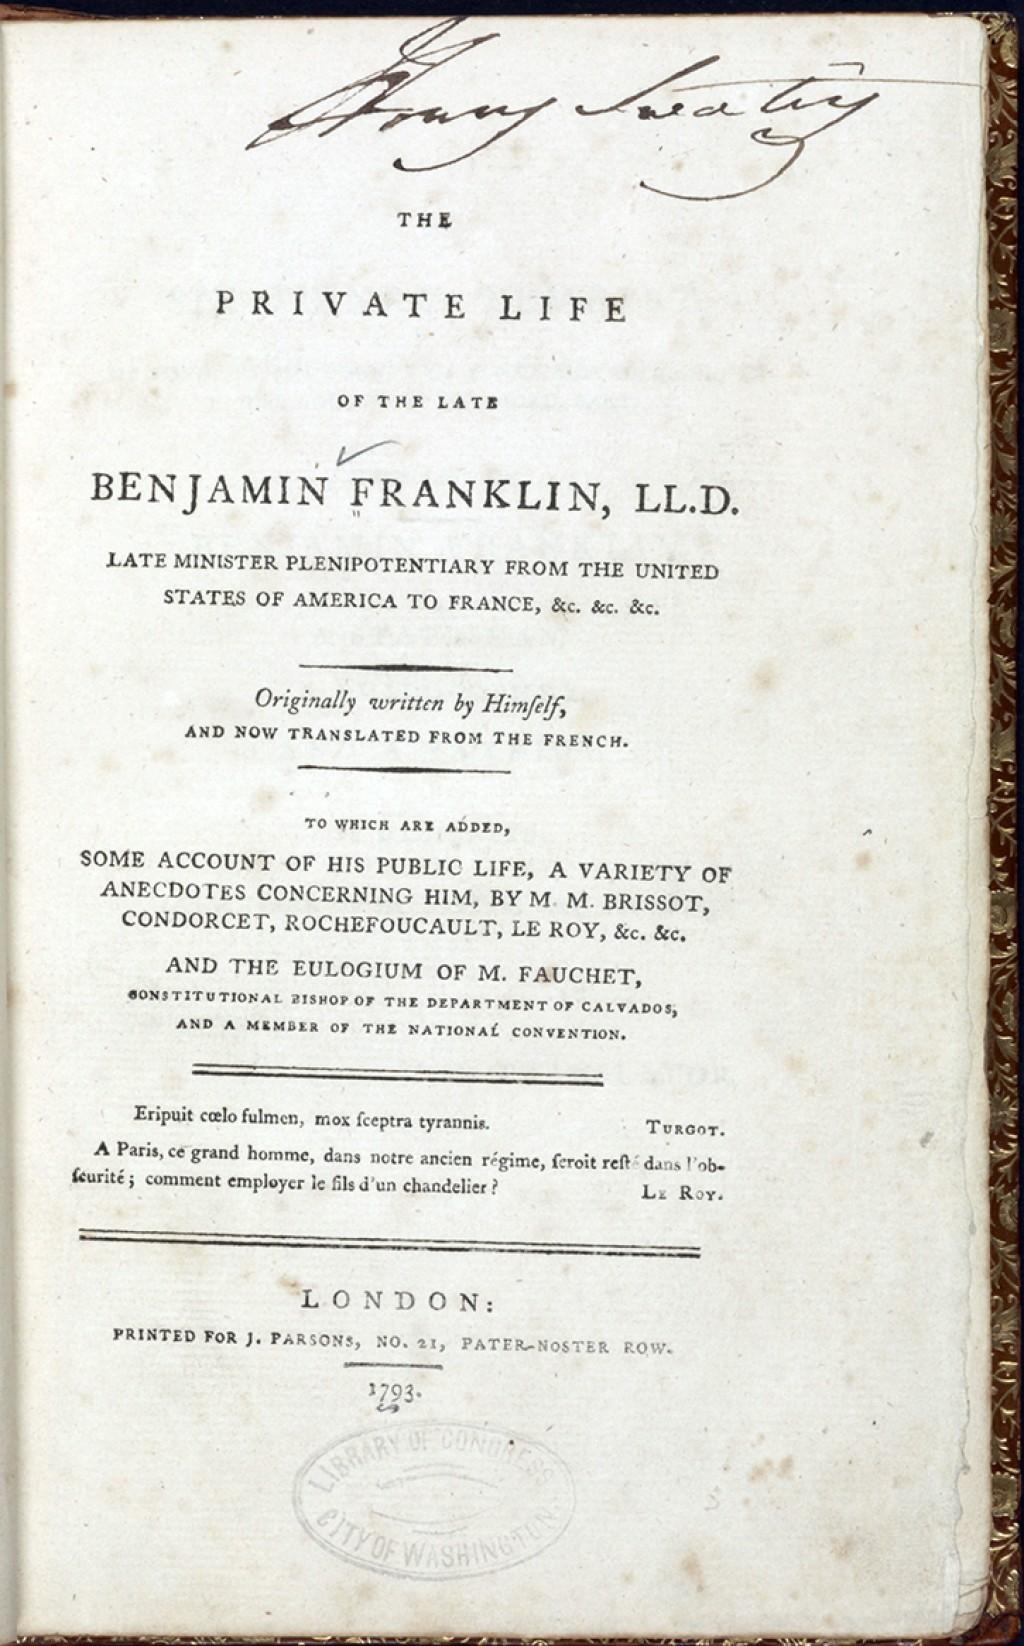 016 Ba0009 Enlarge Benjamin Franklin Essay Unbelievable Thesis Statement Conclusion Large